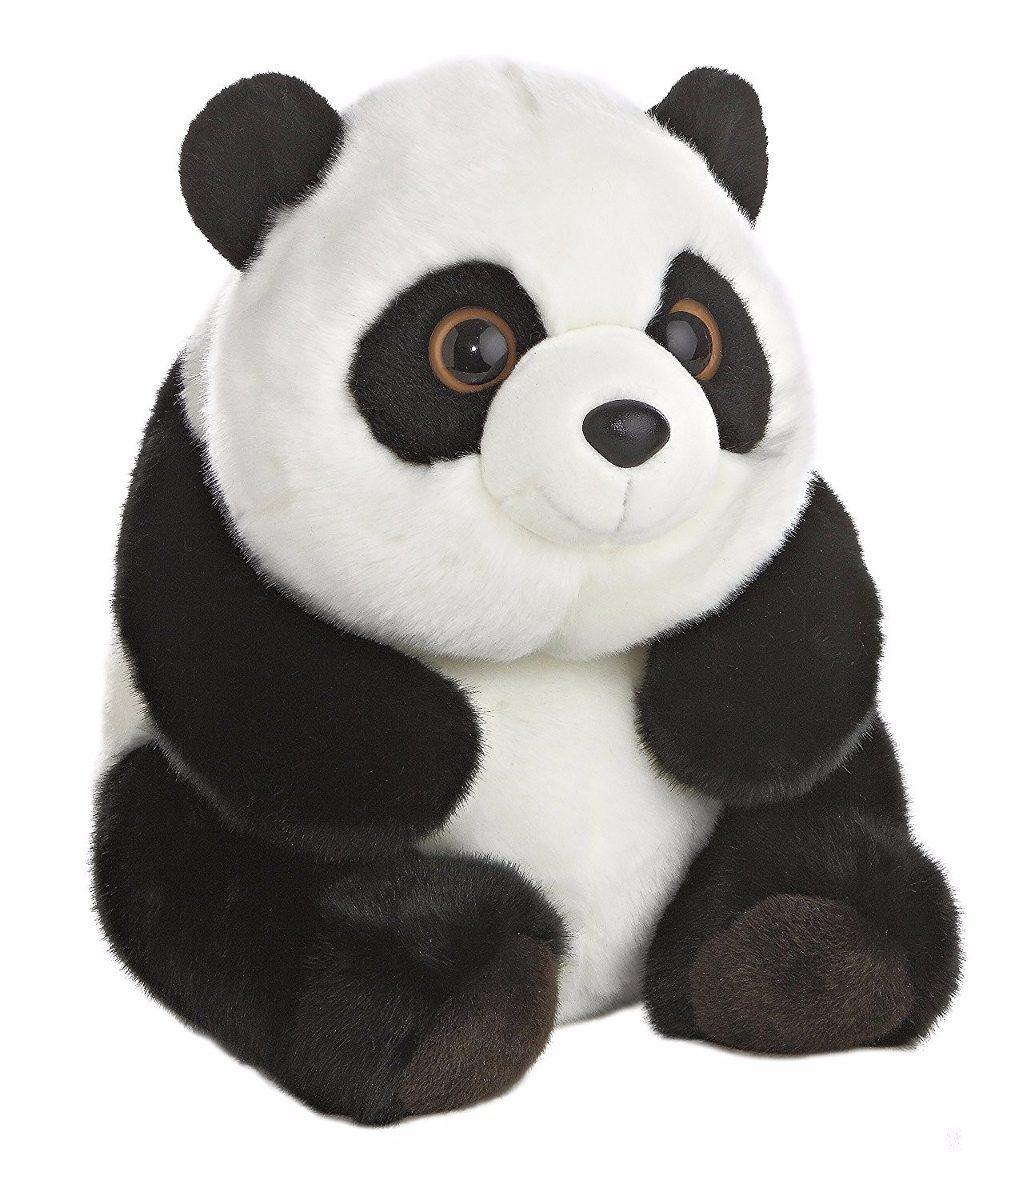 Peluche Osito Panda Negro Y Blanco Aurora S 149 90